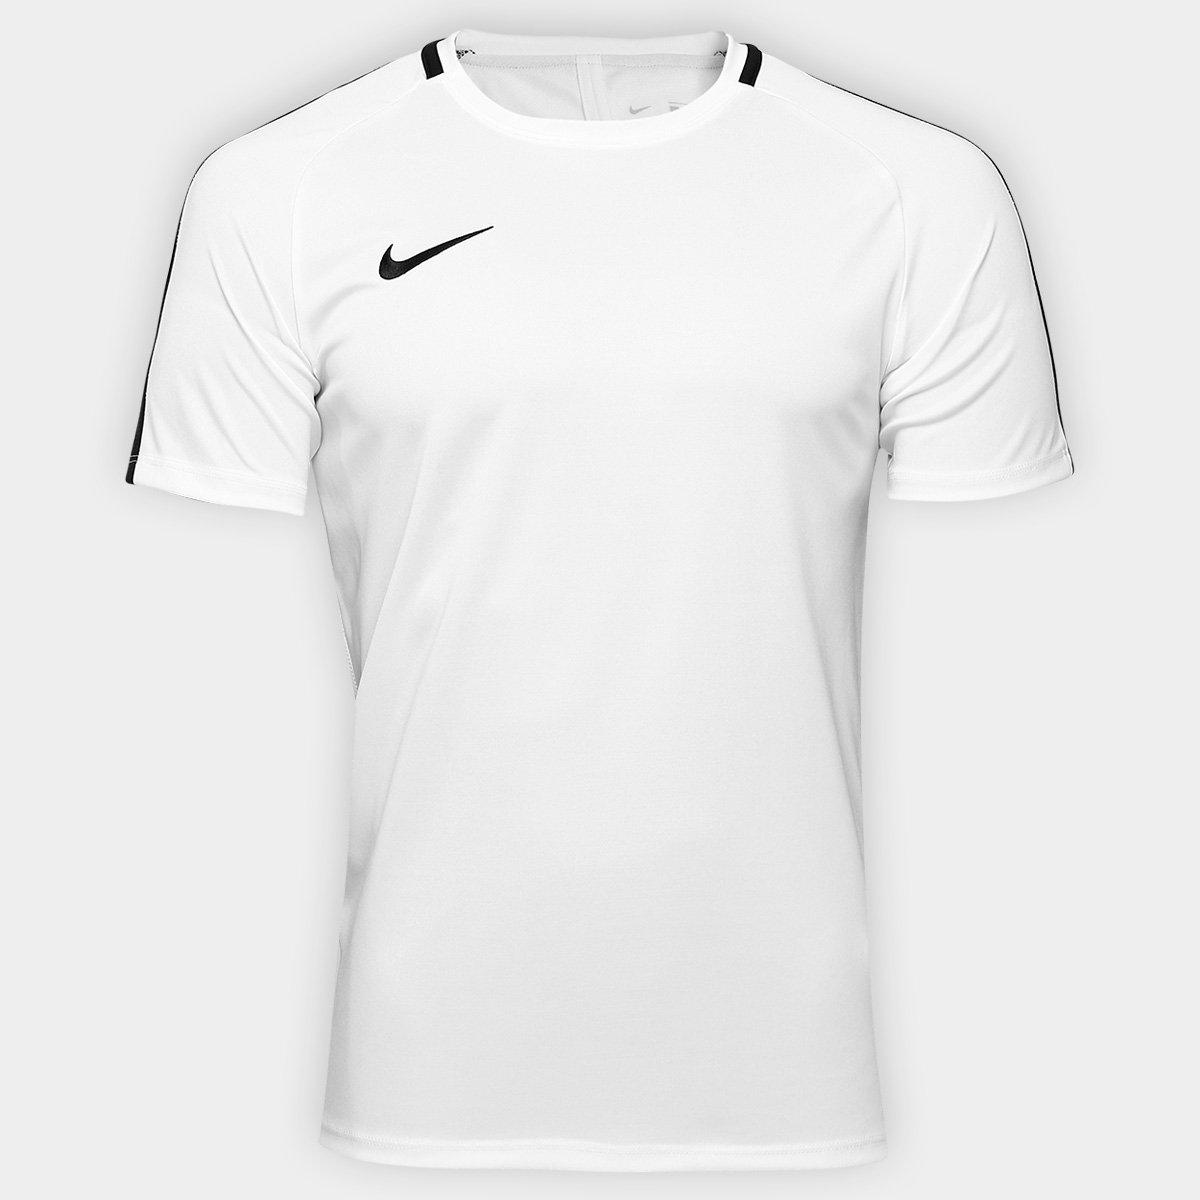 Camisa Nike Academy Masculina - Branco e Preto - Compre Agora  05a285dd7b27f